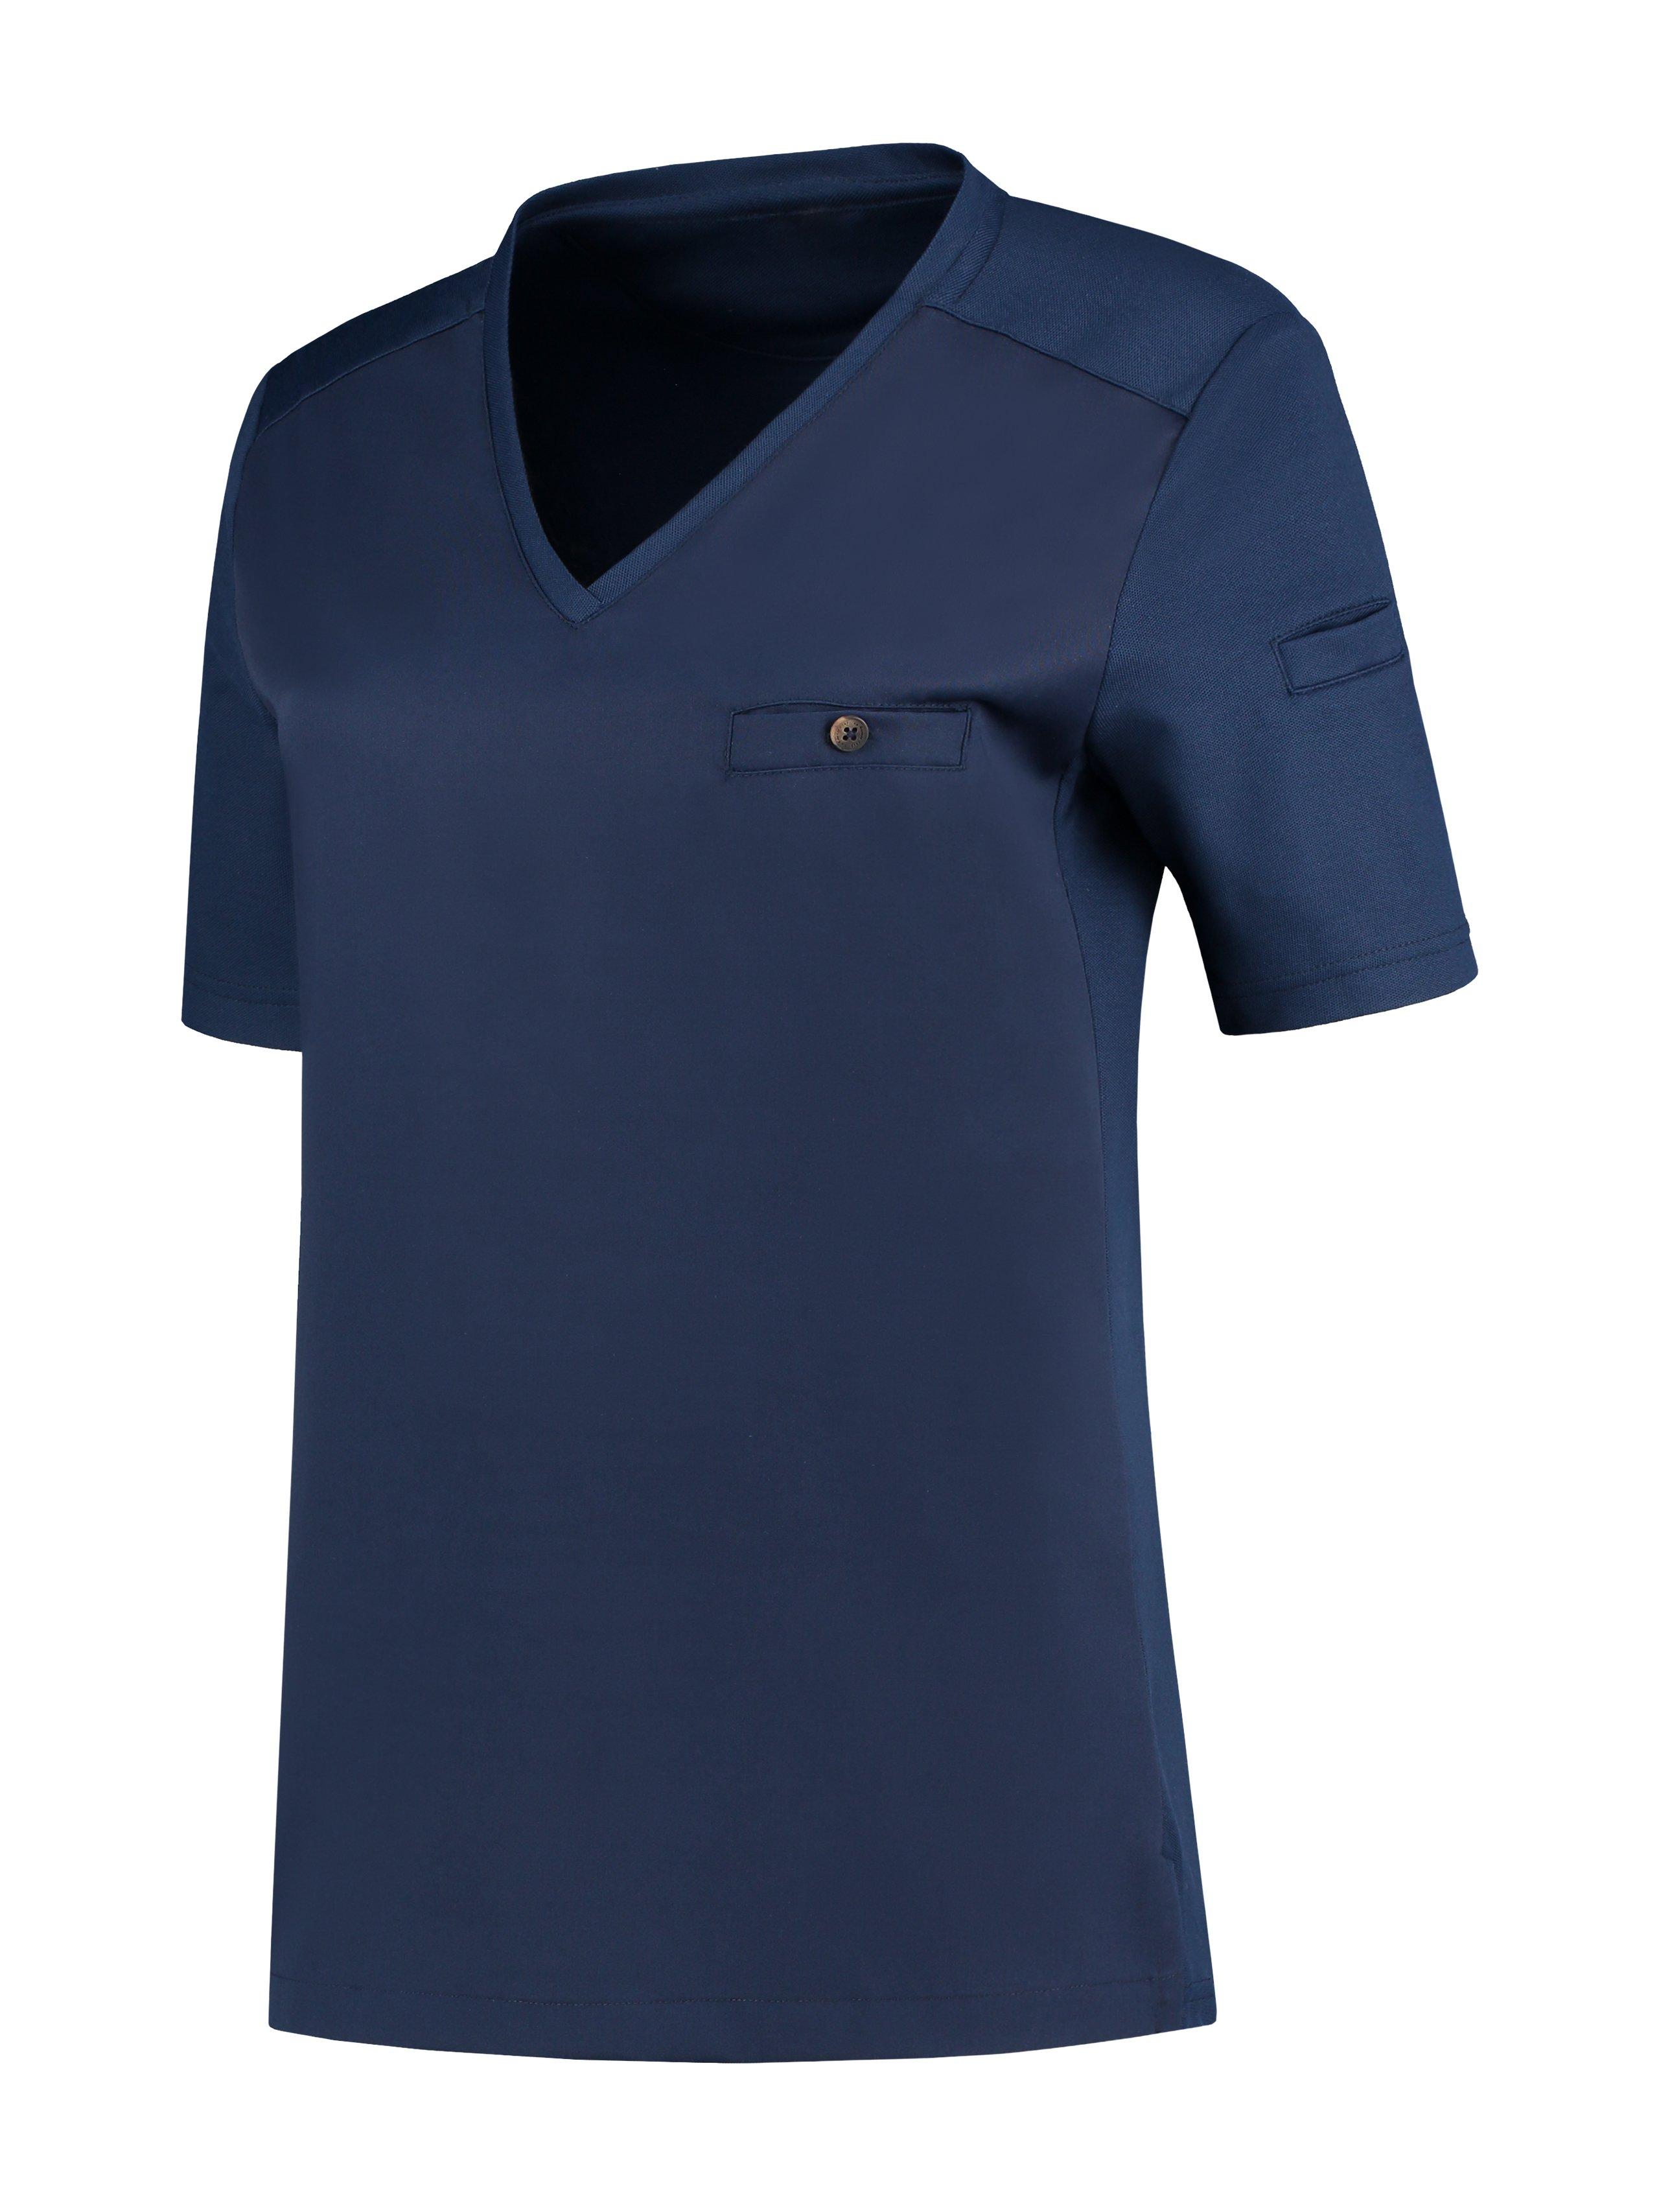 Chef Jacket Fae Patriot Blue